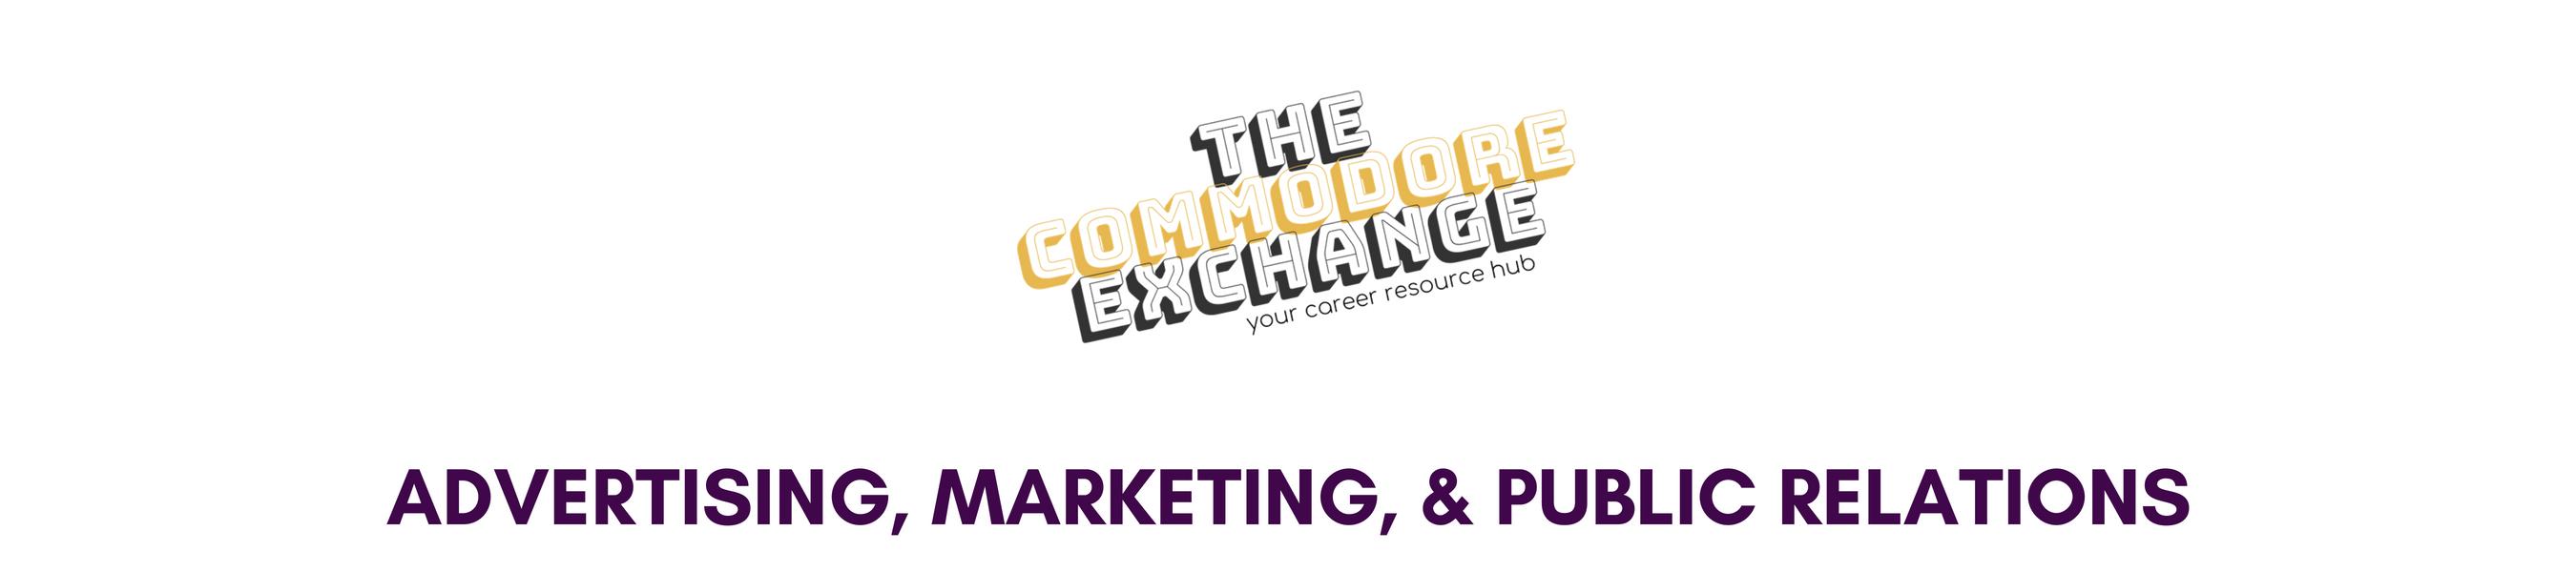 advertising  marketing  public relations